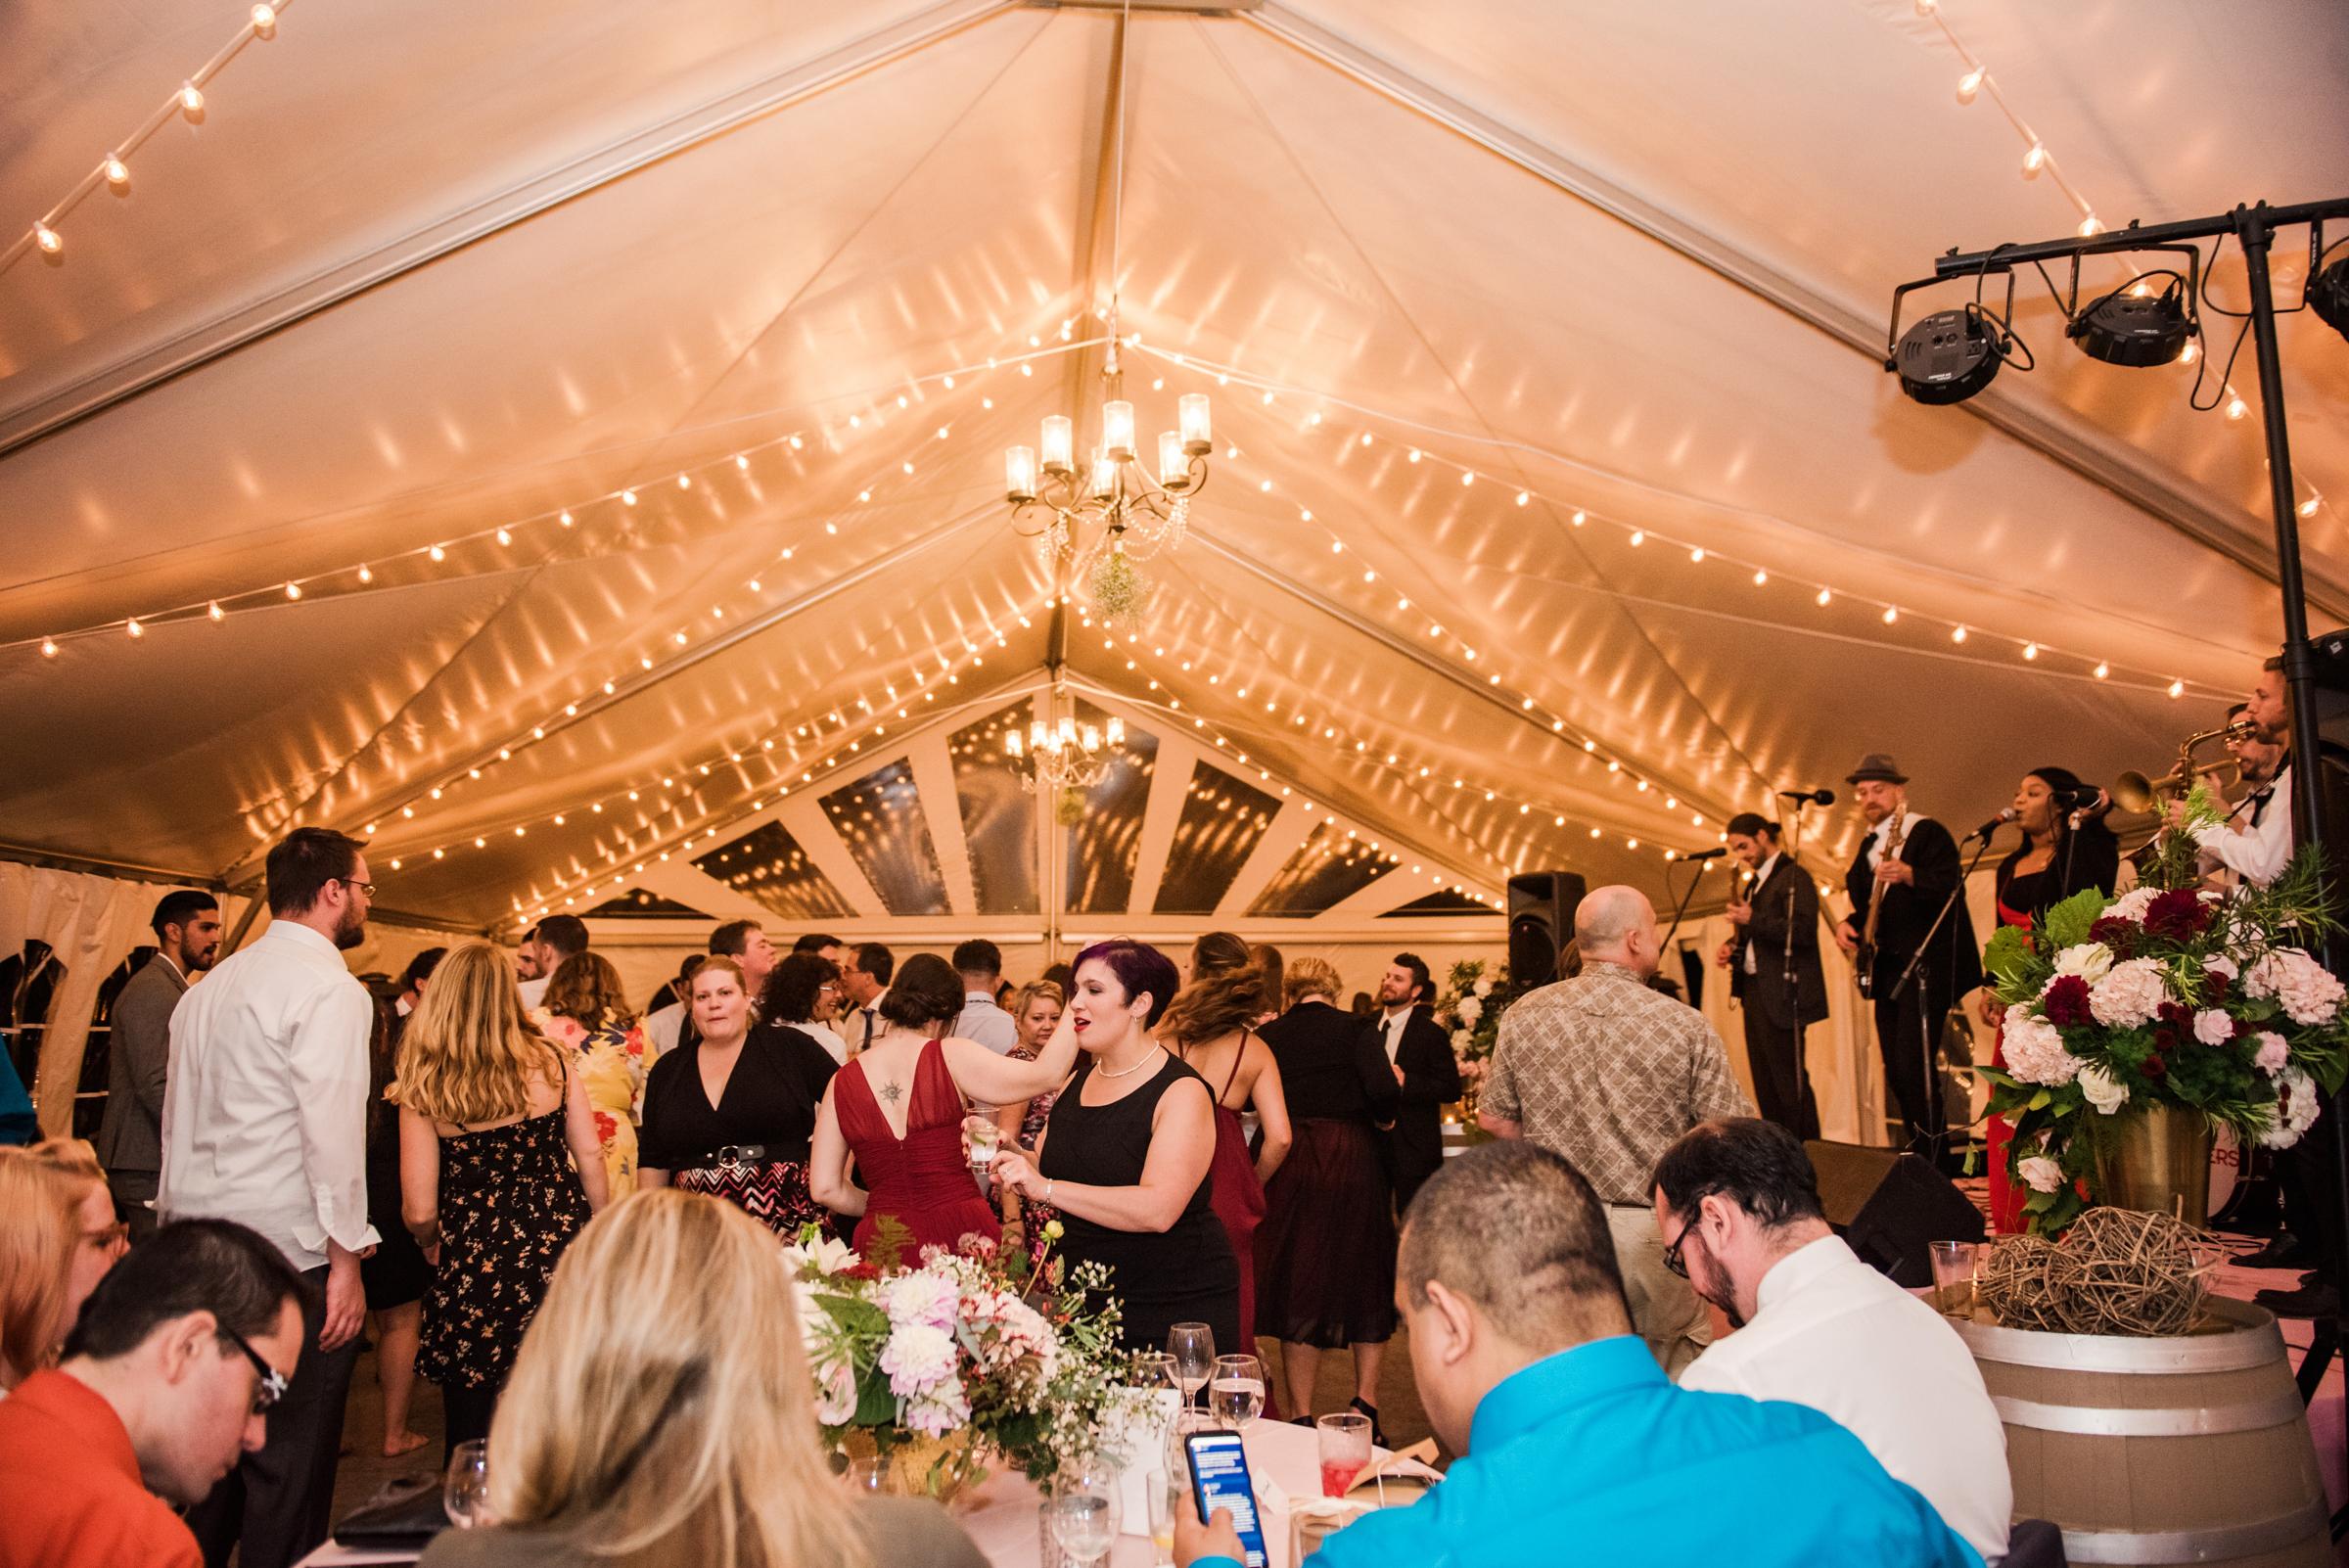 Zugibe_Vineyards_Finger_Lakes_Wedding_JILL_STUDIO_Rochester_NY_Photographer_DSC_4515.jpg